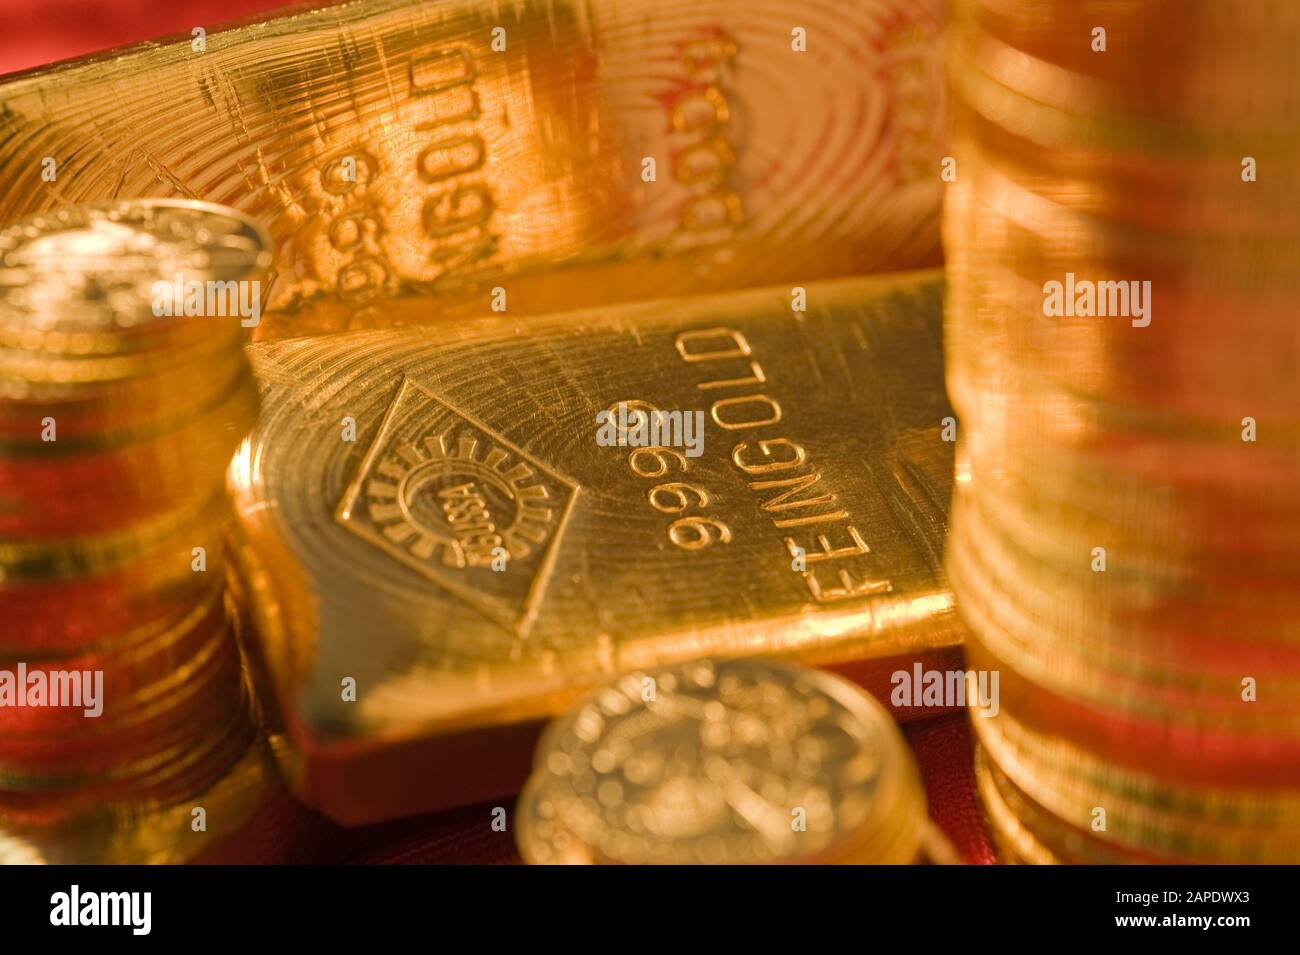 Ein Ögussa-Feingoldbarren - Gold Bar Stock Photo